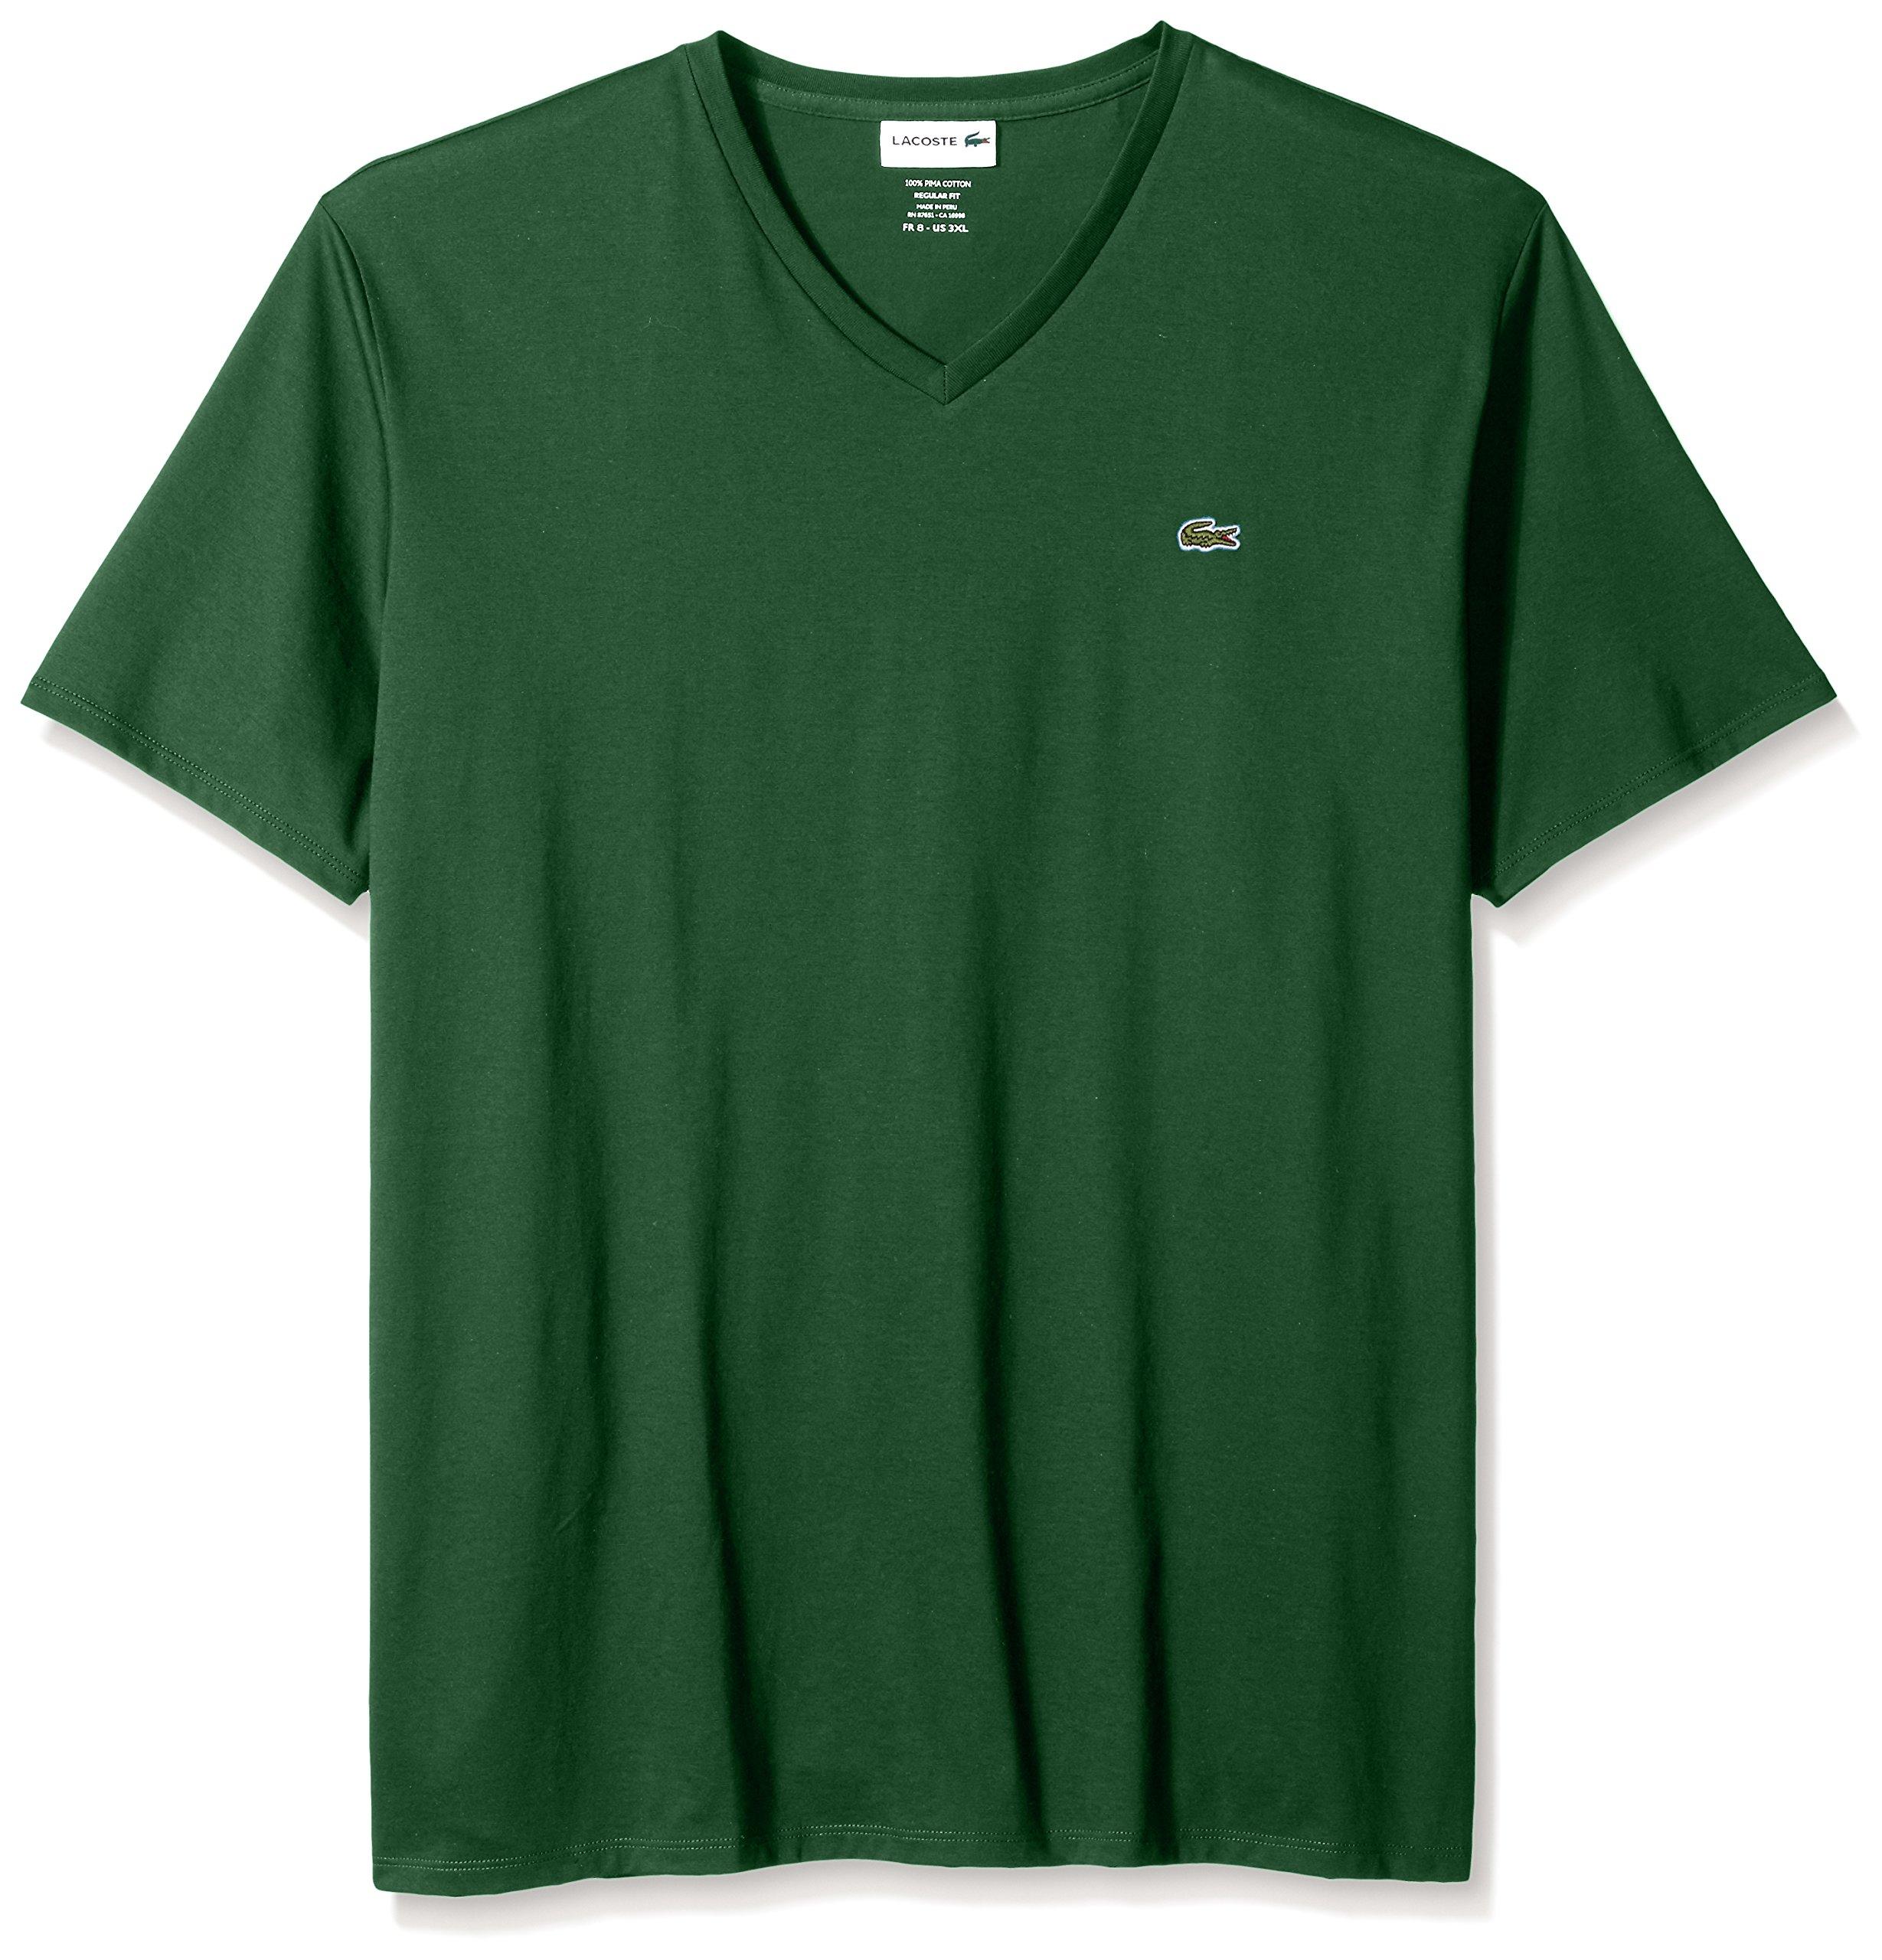 Lacoste Men's Short Sleeve V-Neck Pima Cotton Jersey T-Shirt, Green, X-Large